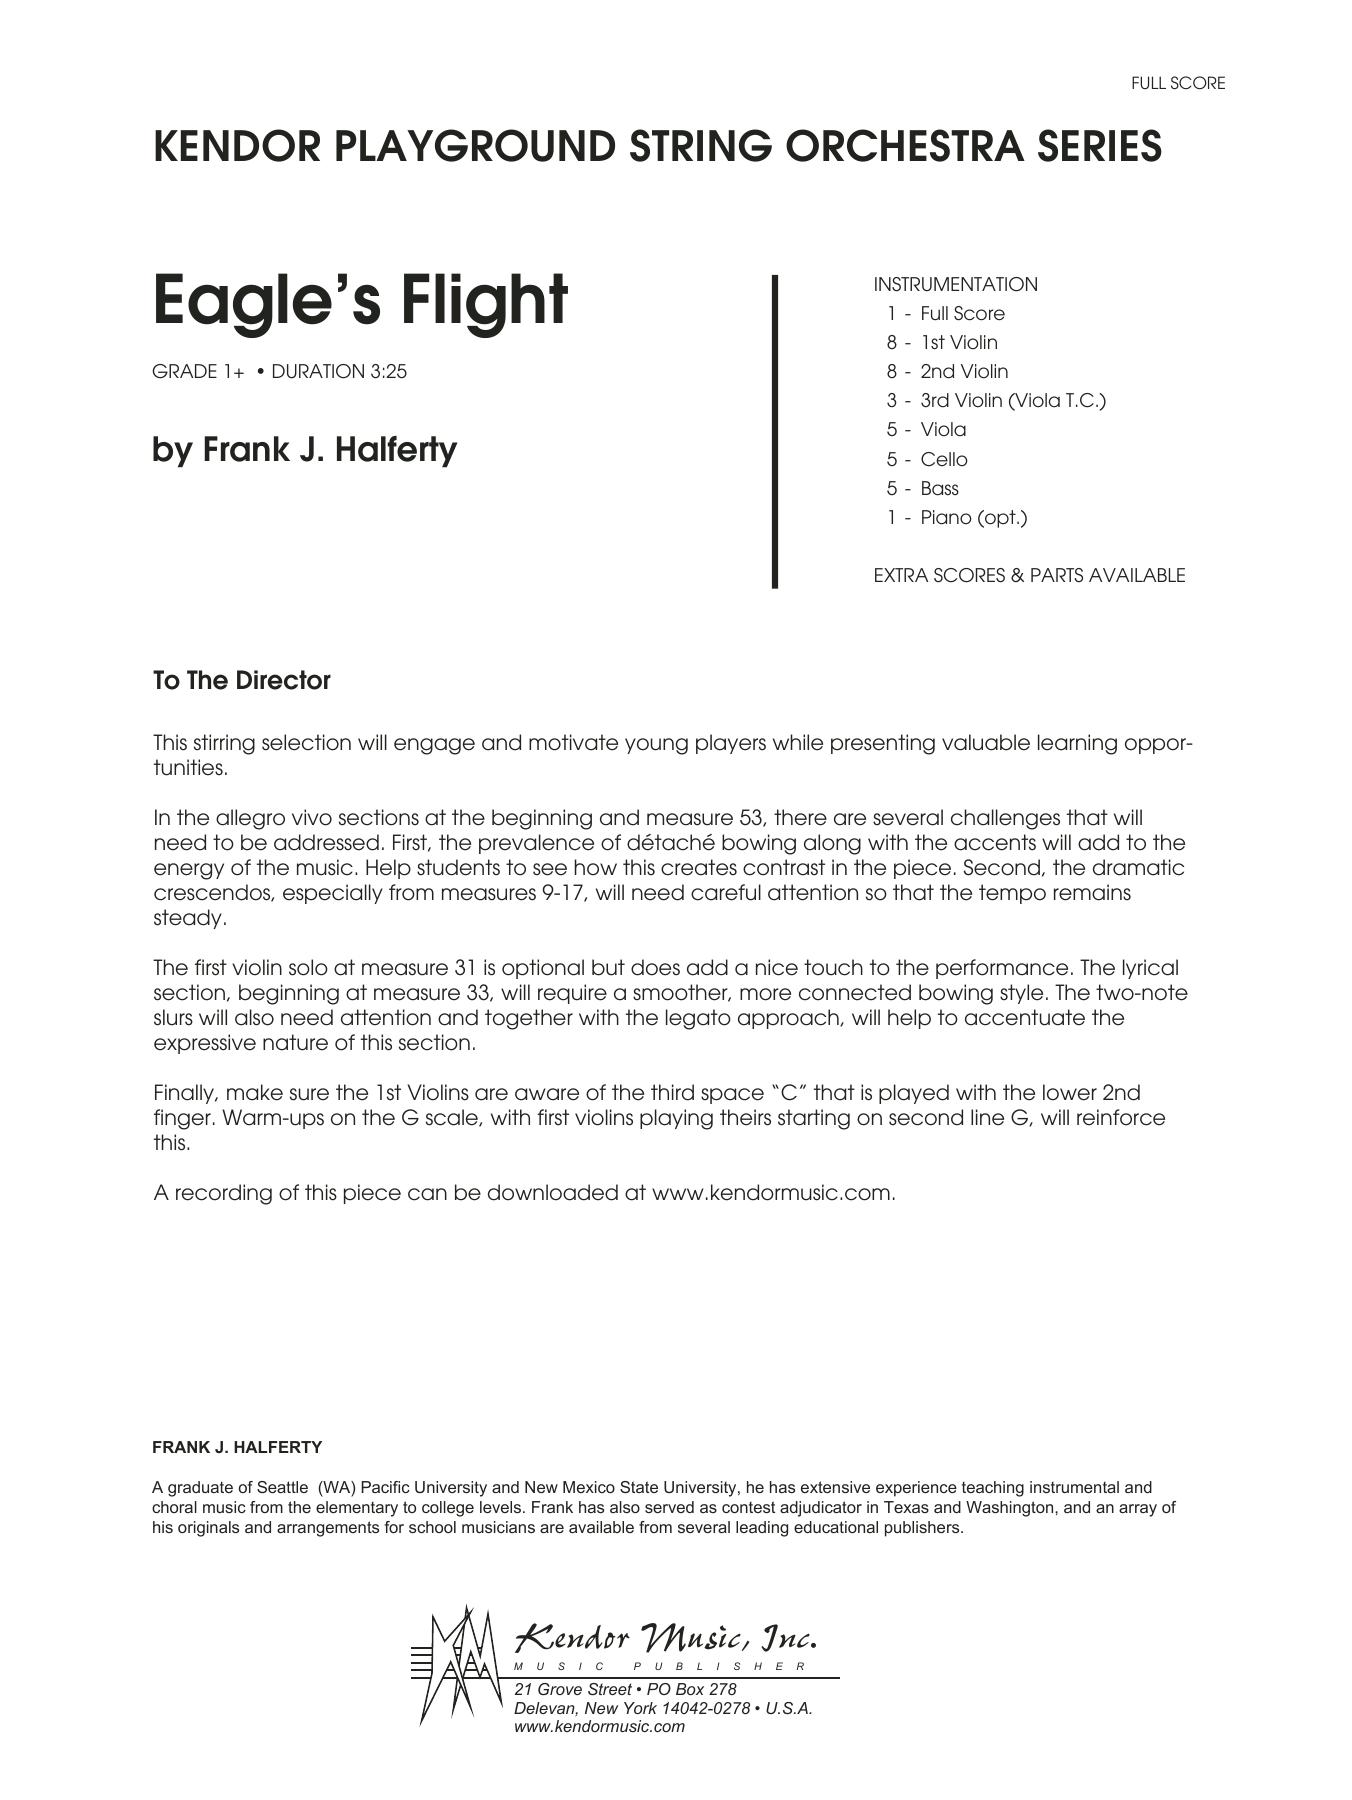 Eagle's Flight - Full Score Sheet Music